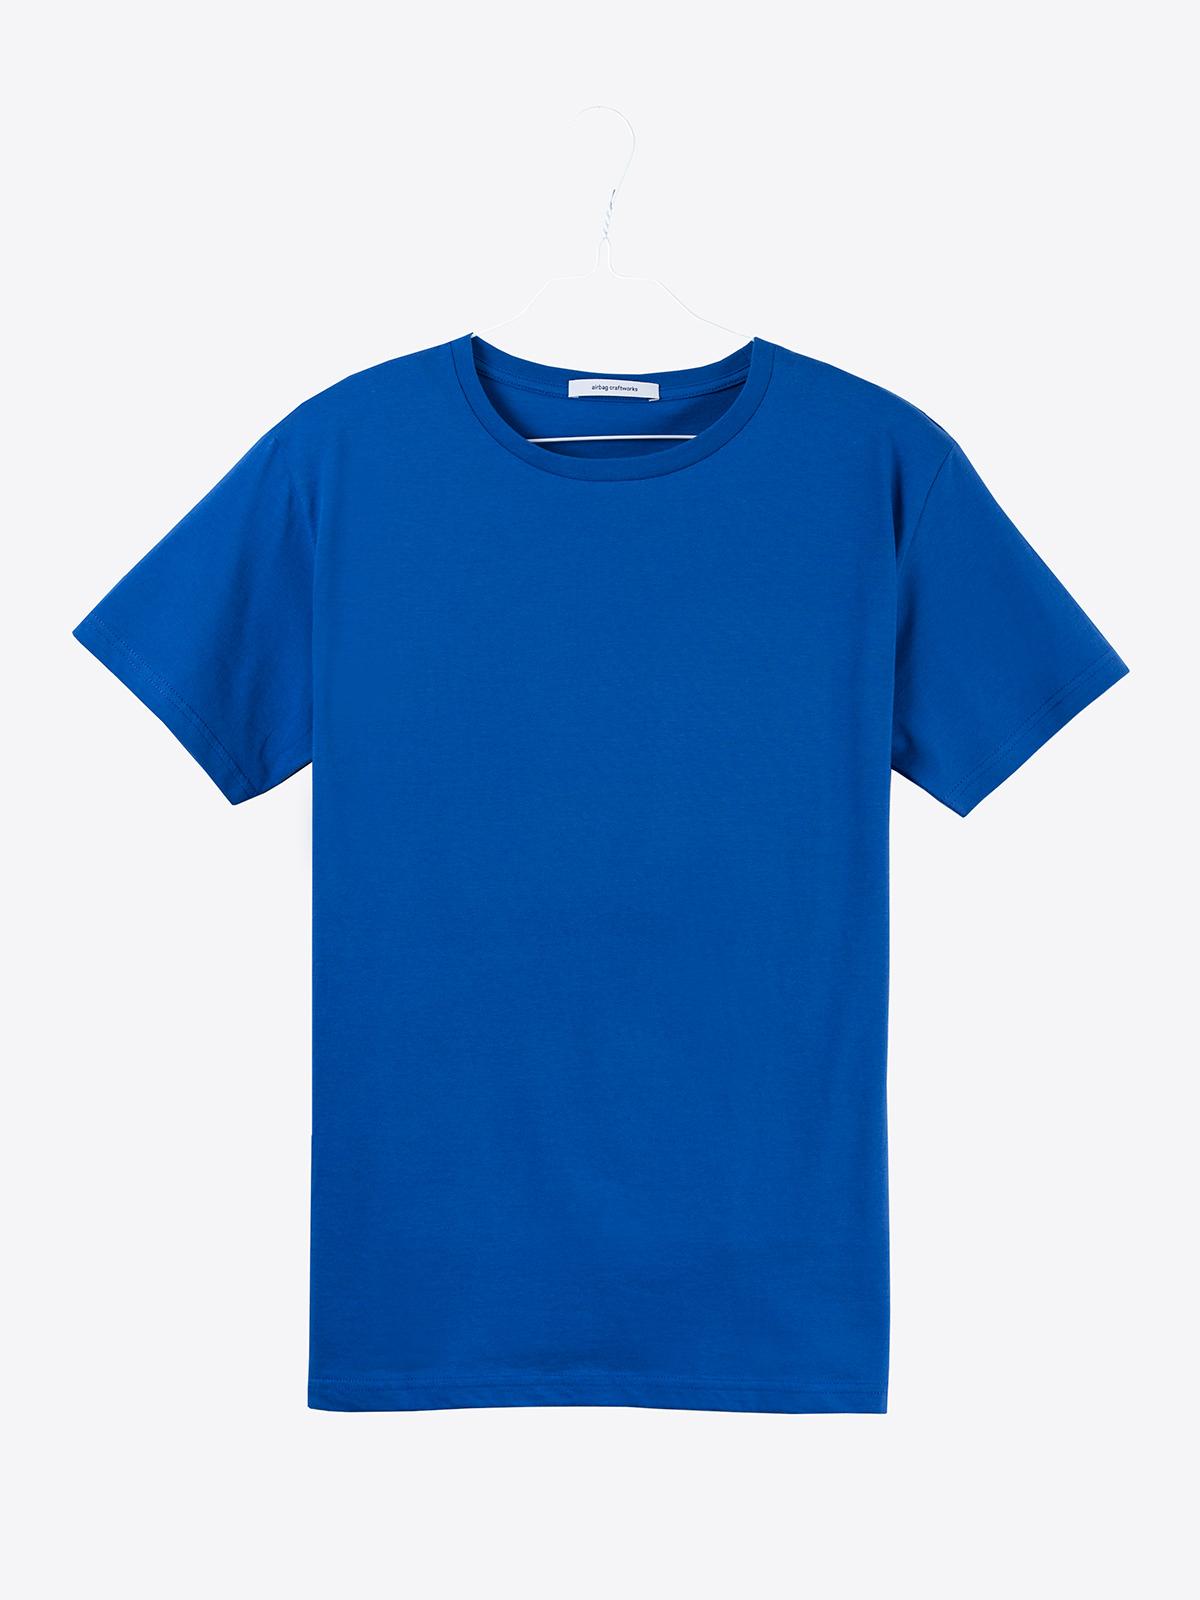 A2  t 01 blank | royal blue